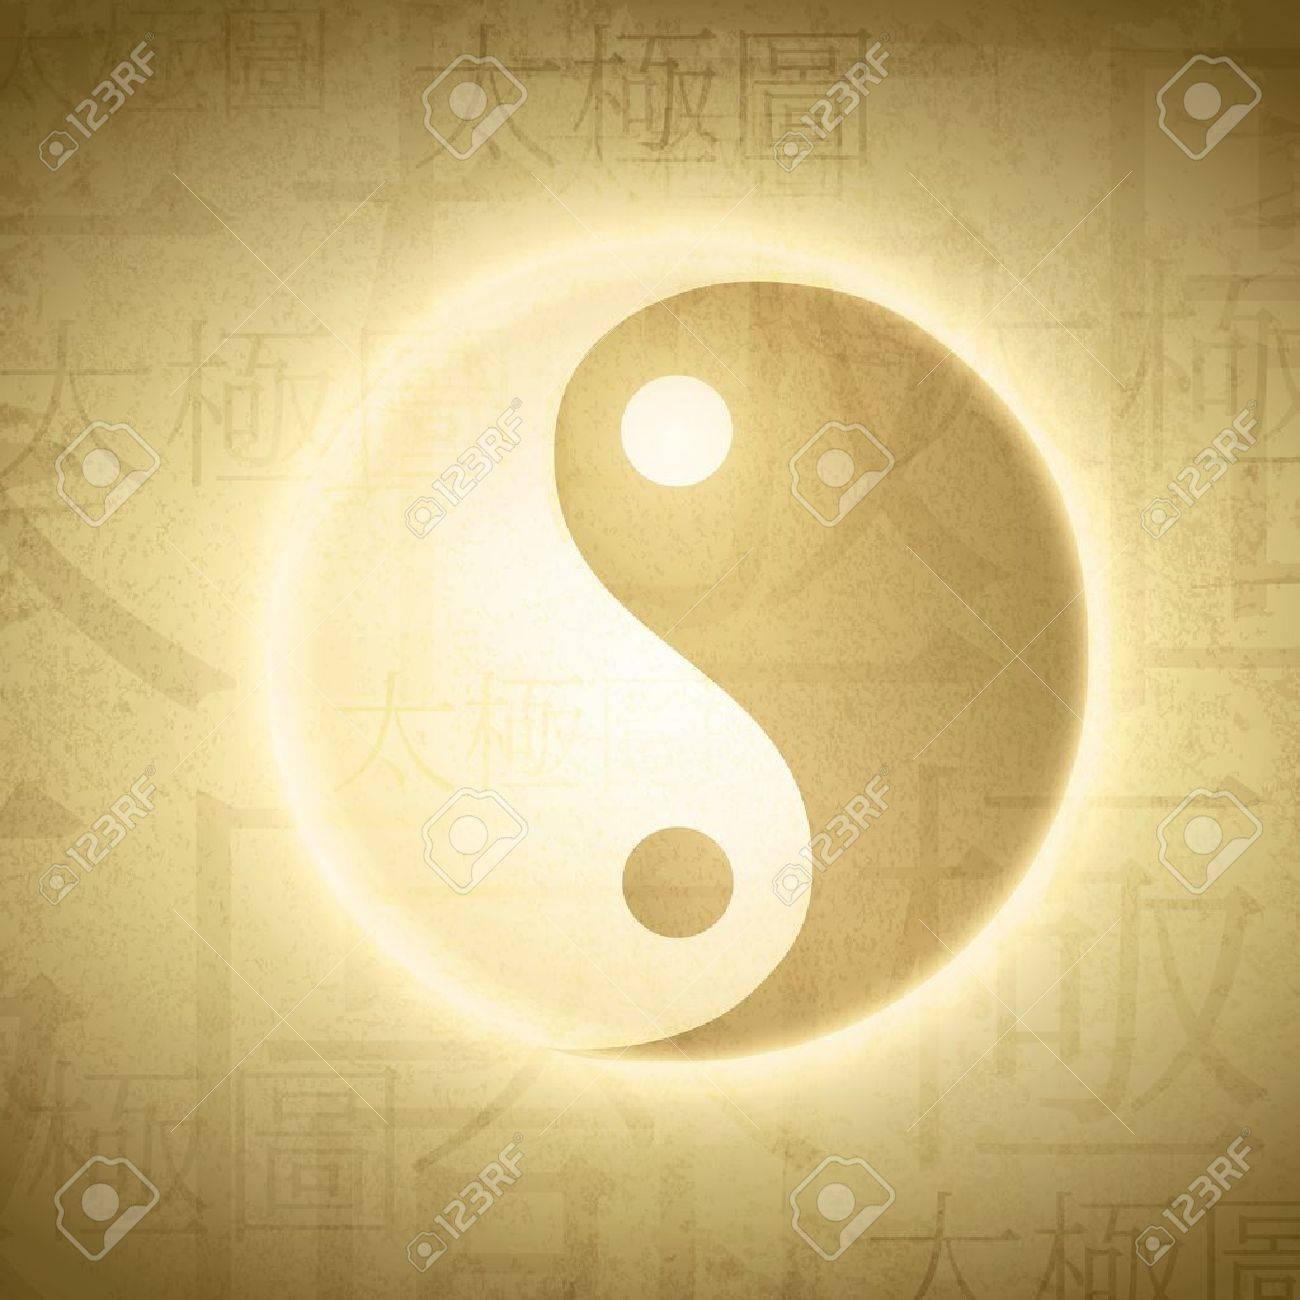 Yin Yang symbol with writing on Chinese - 13468981